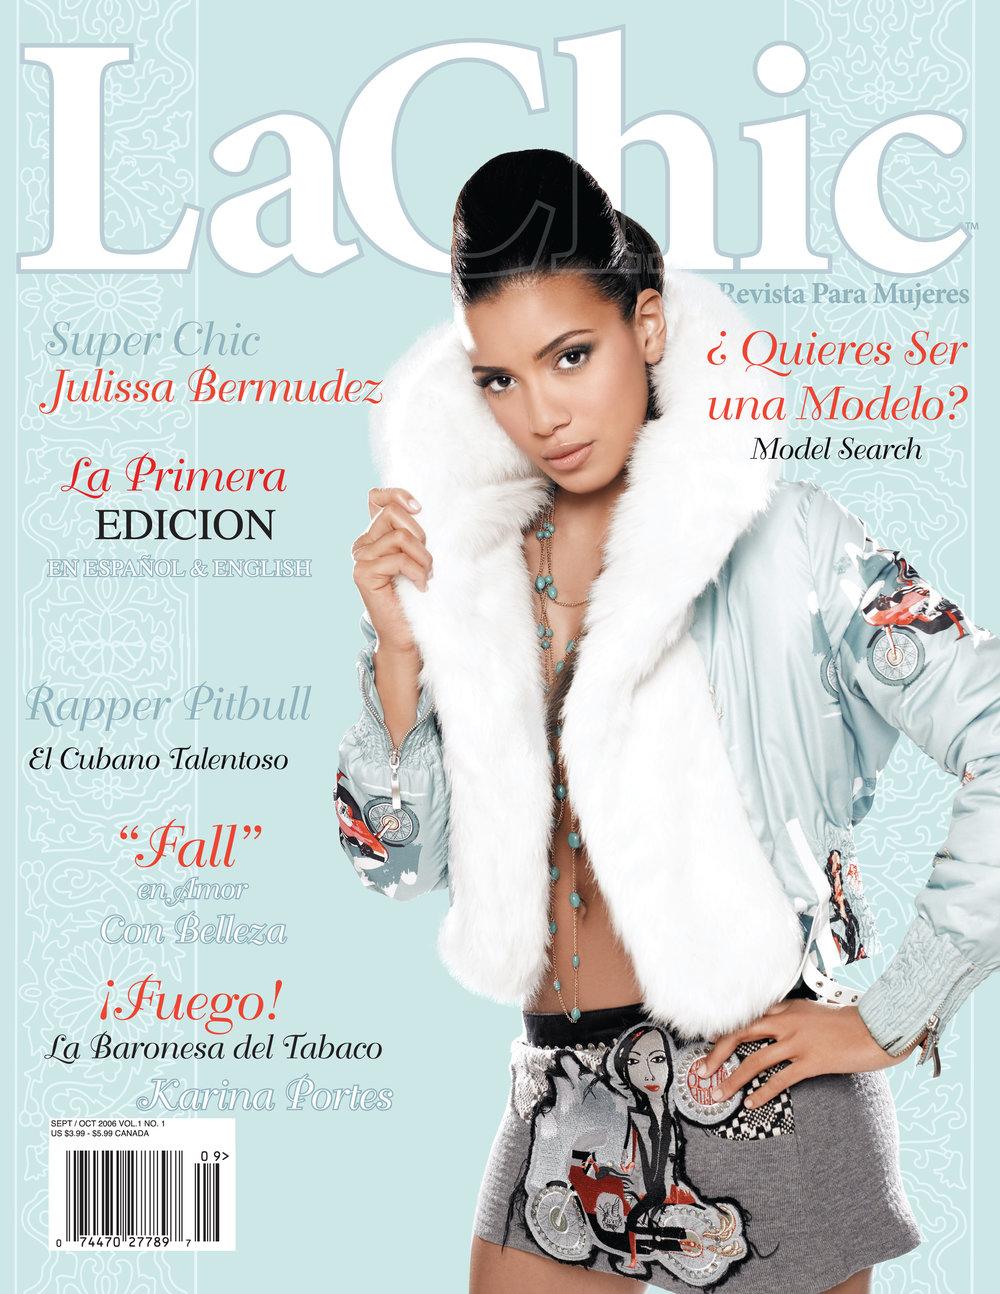 LACHIC-Cover1.jpg